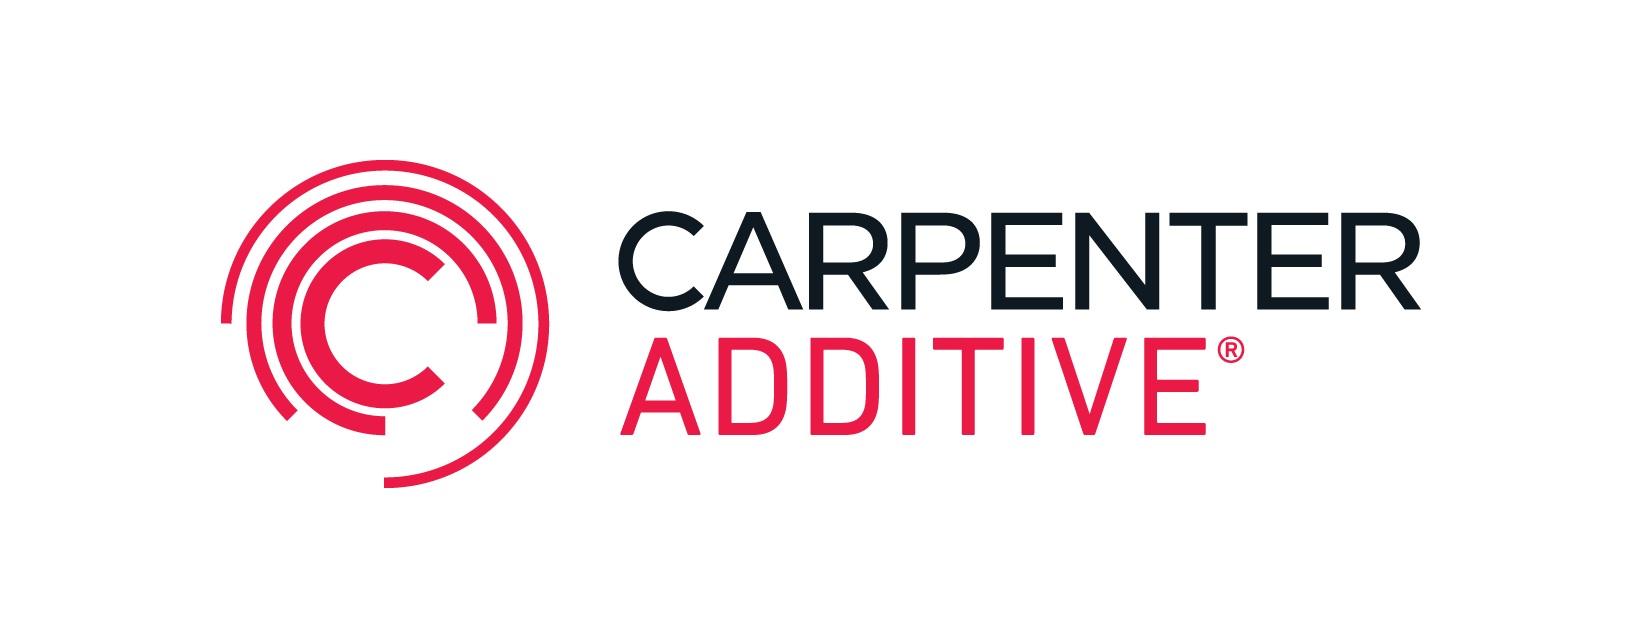 Carpenter Additive logo. Image via Carpenter Additive.